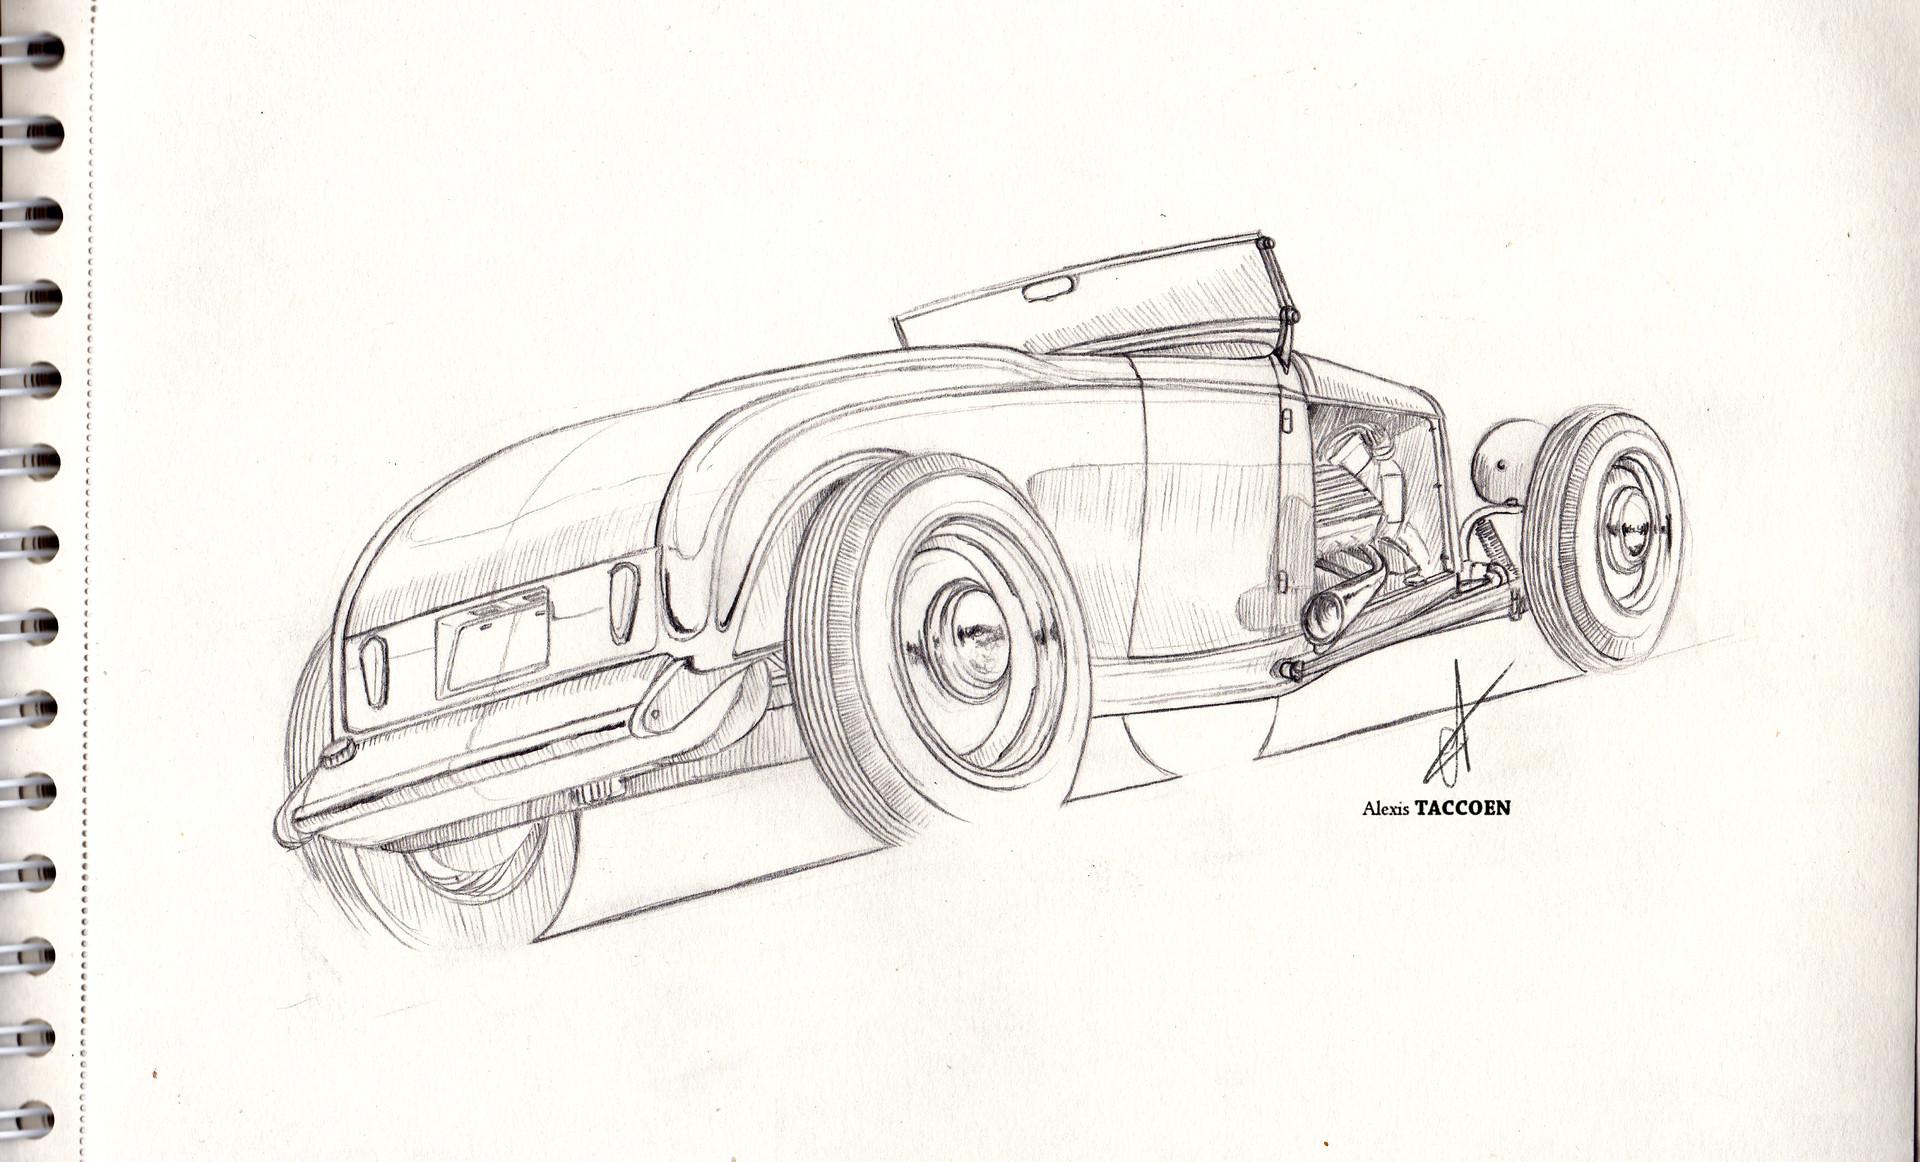 Alexis taccoen hot rod sketch